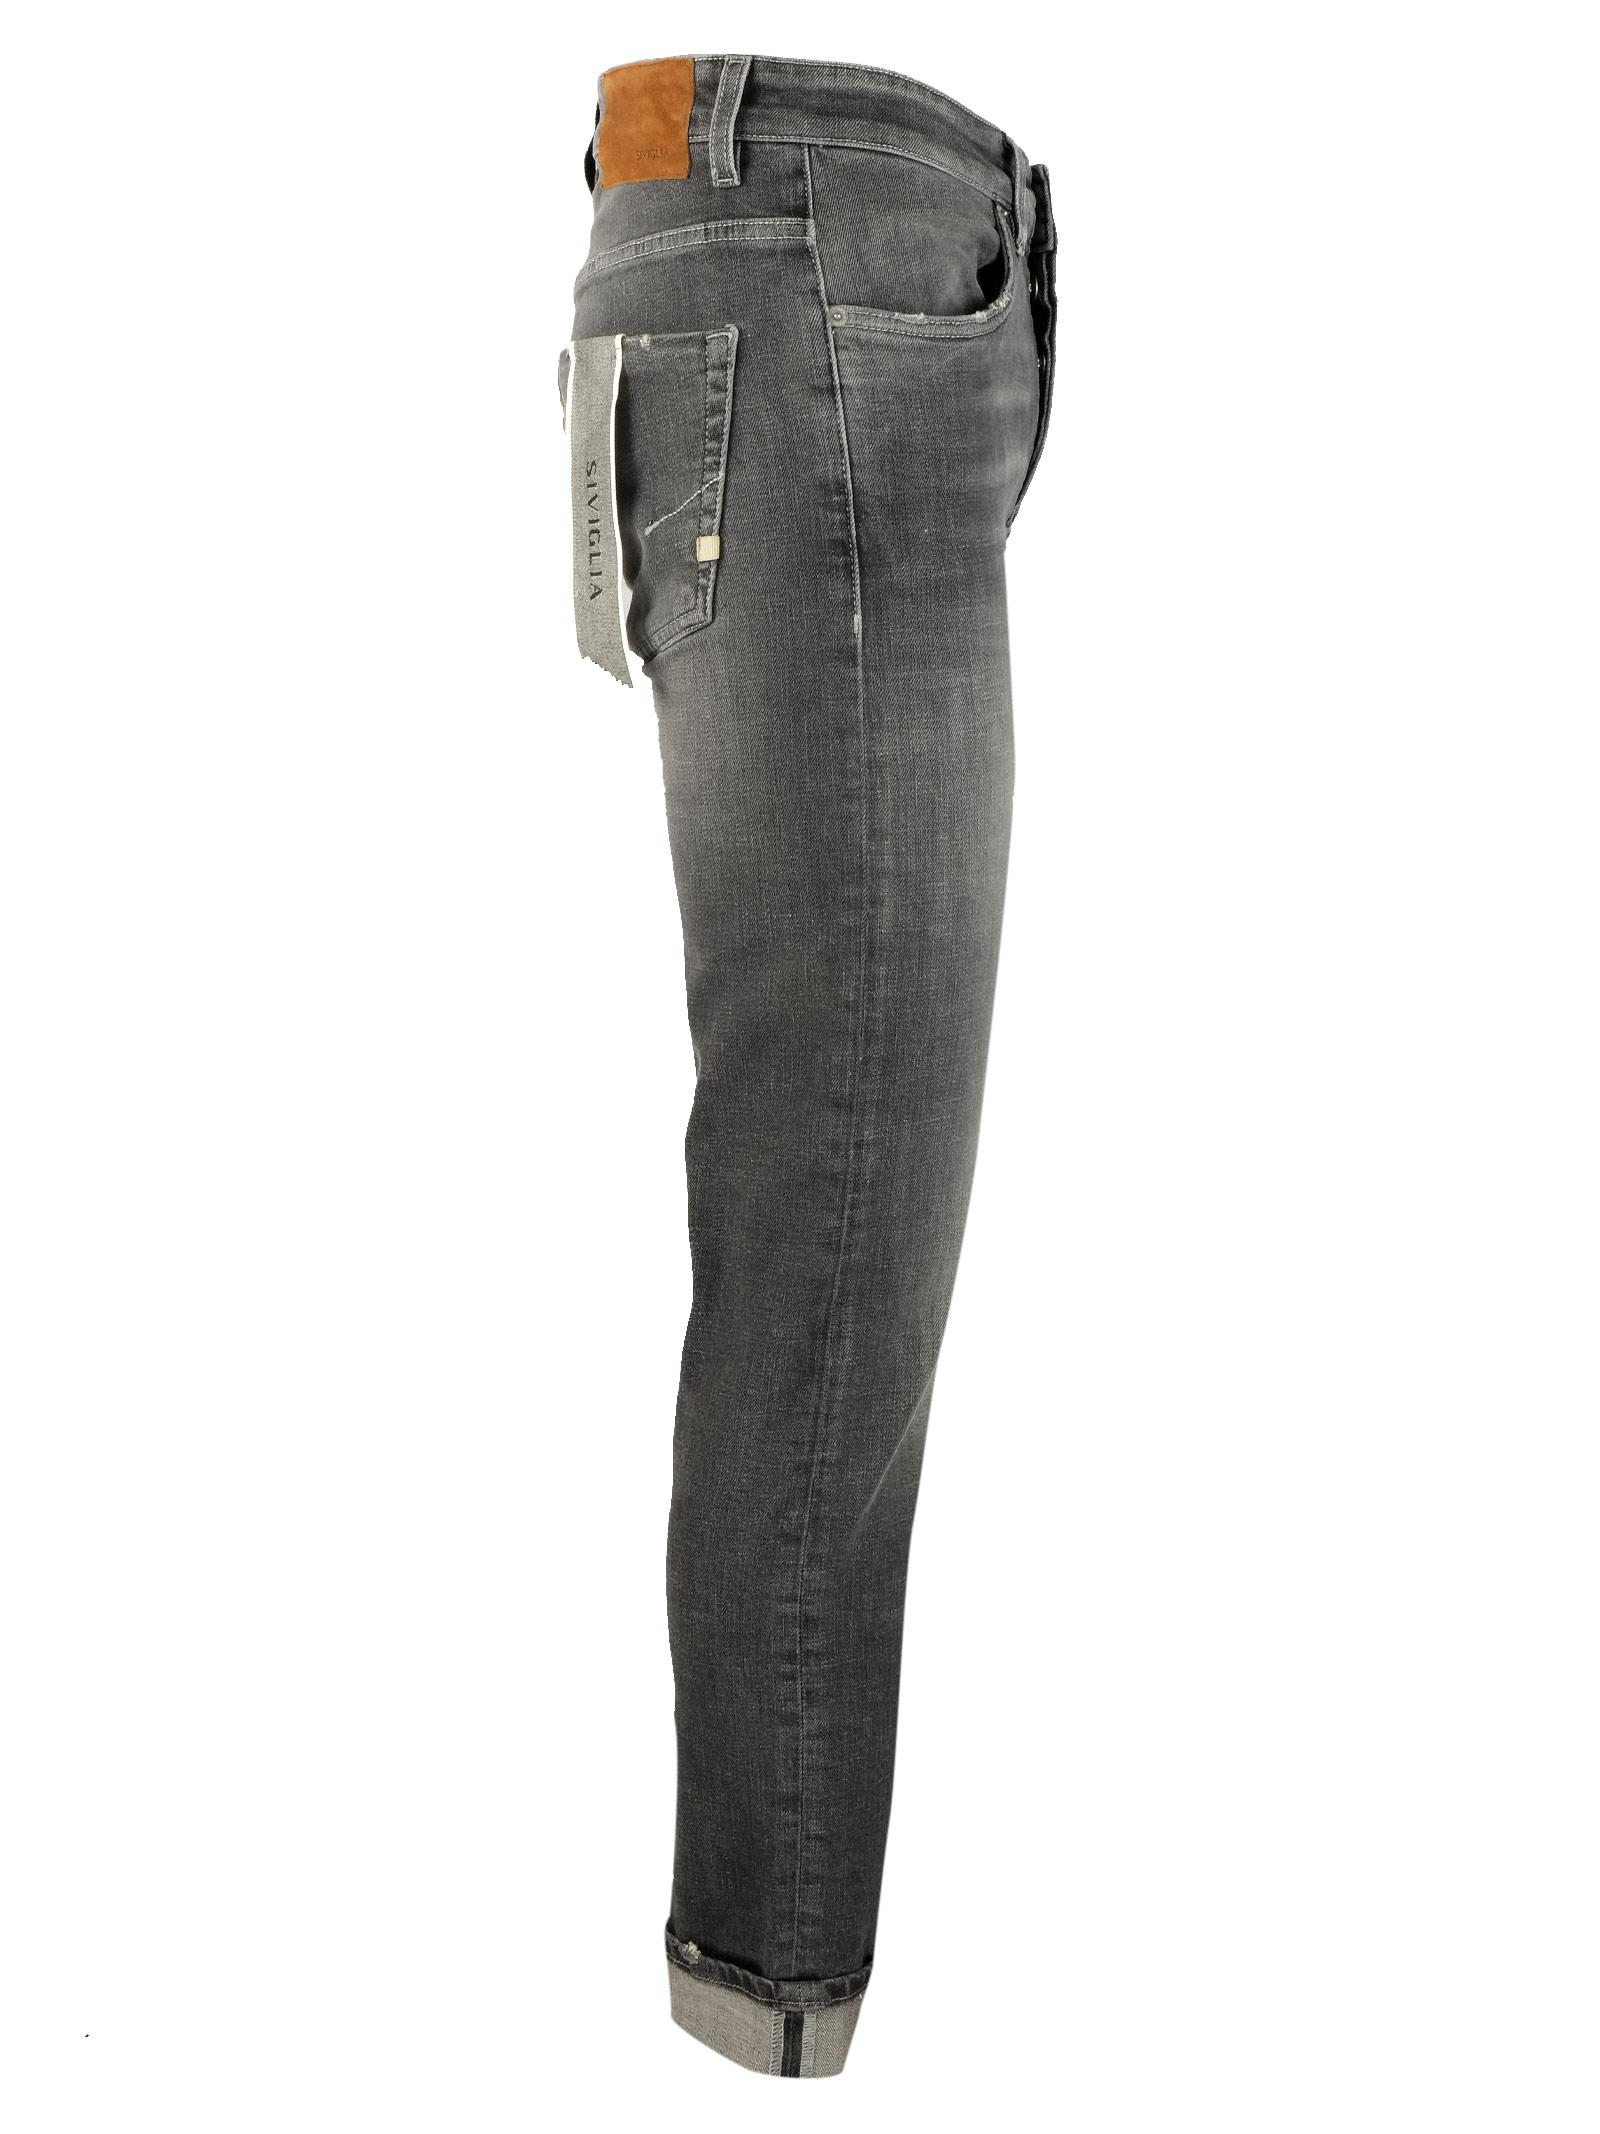 Jeans 10 once grigio SIVIGLIA | Pantaloni | MQ2001 801809002